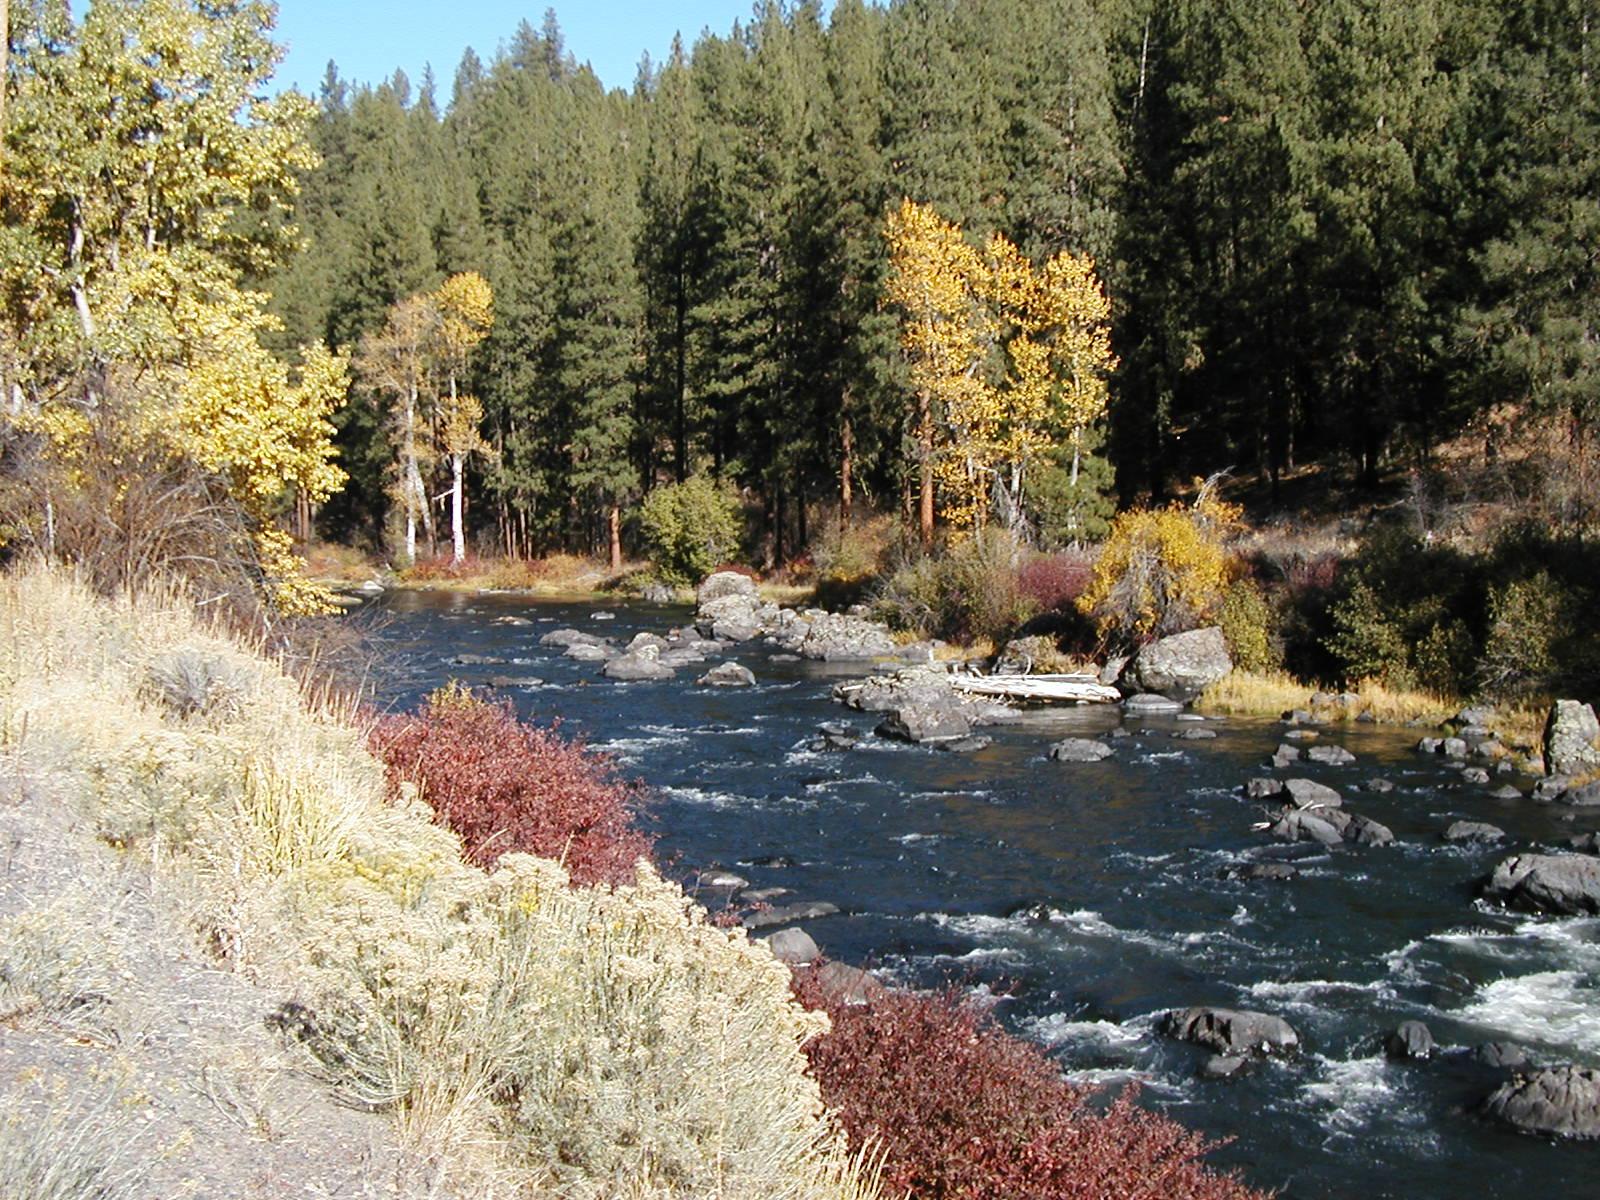 Usgs Oregon Water Science Center Sprague Basin Geomorphology